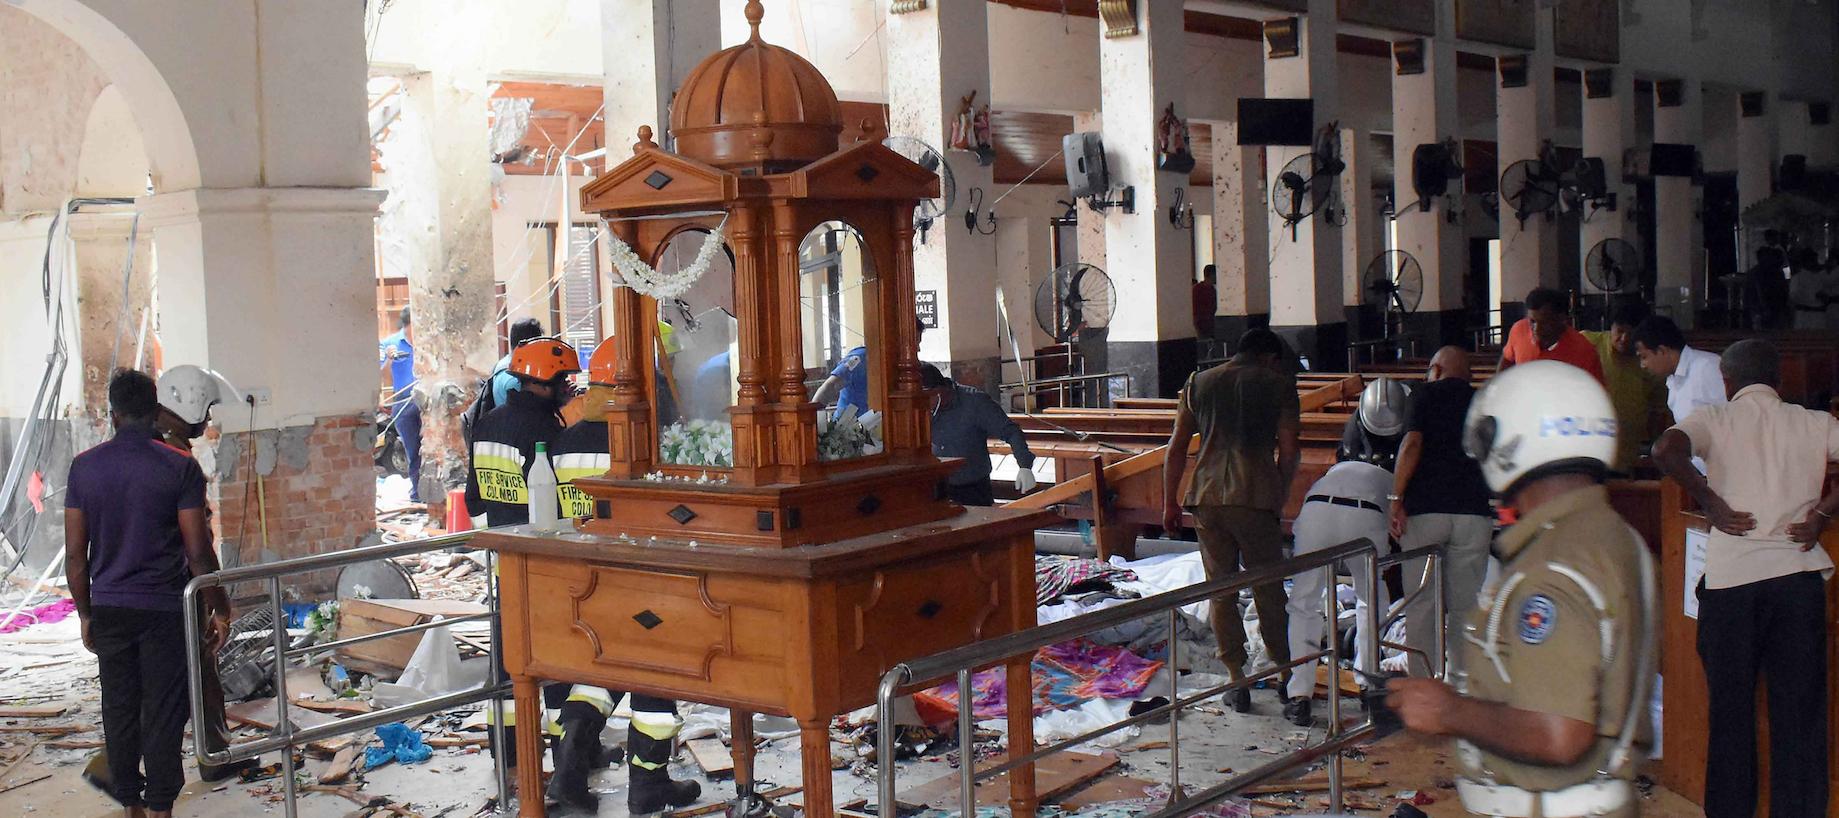 People work at a blast scene at St. Anthony's Church in Kochchikade in Colombo, Sri Lanka